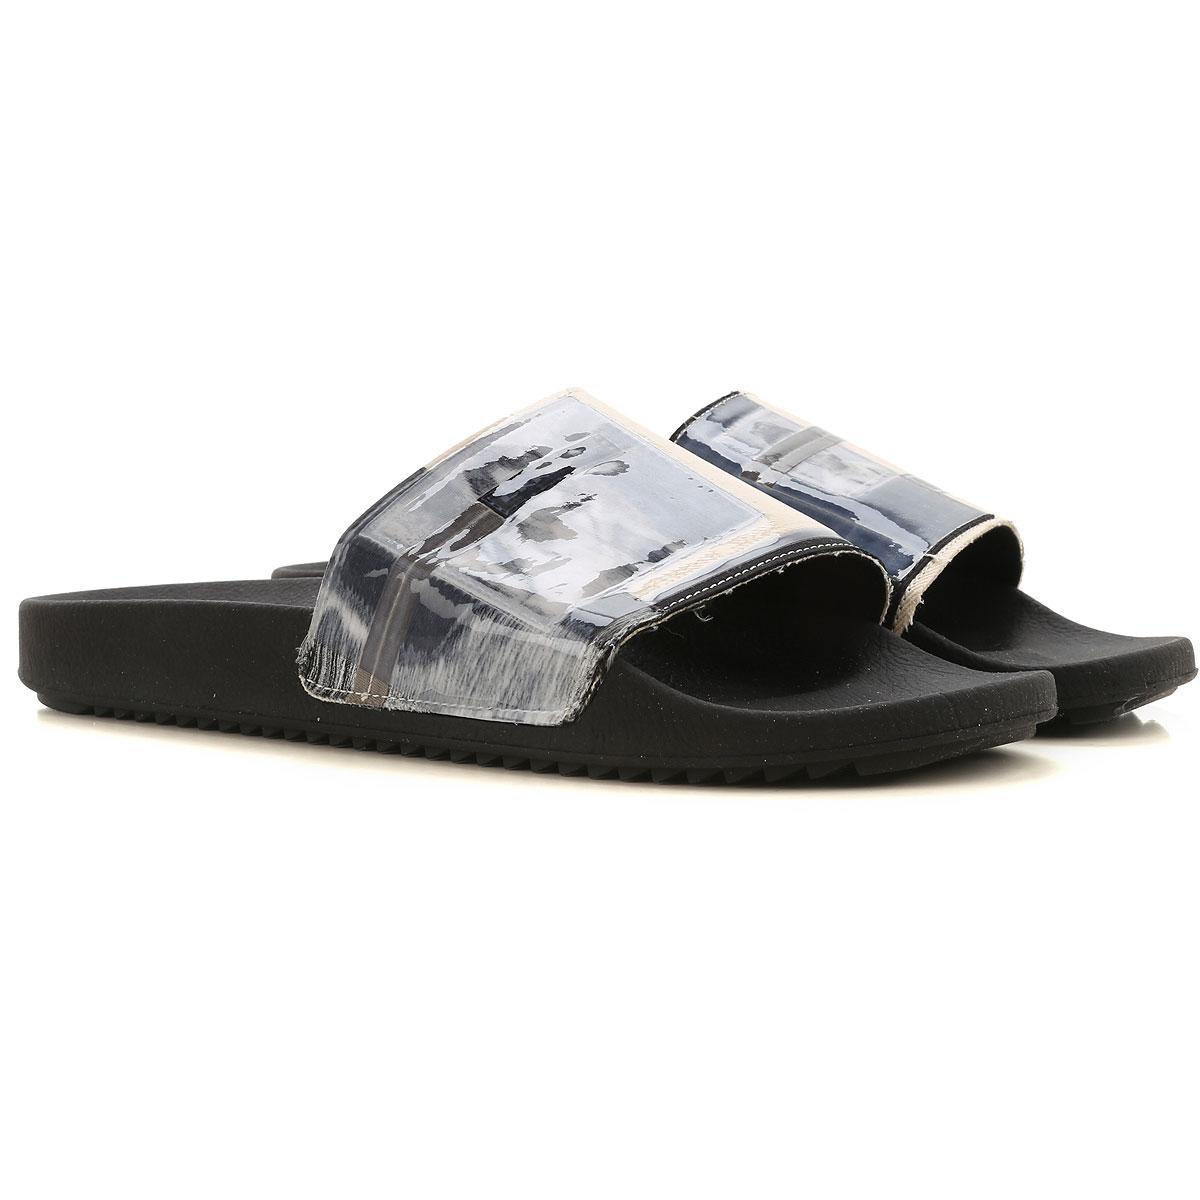 Rick Owens DRKSHDW Sandals for Men On Sale, Black, PVC, 2019, 10 10.5 7.5 8 9